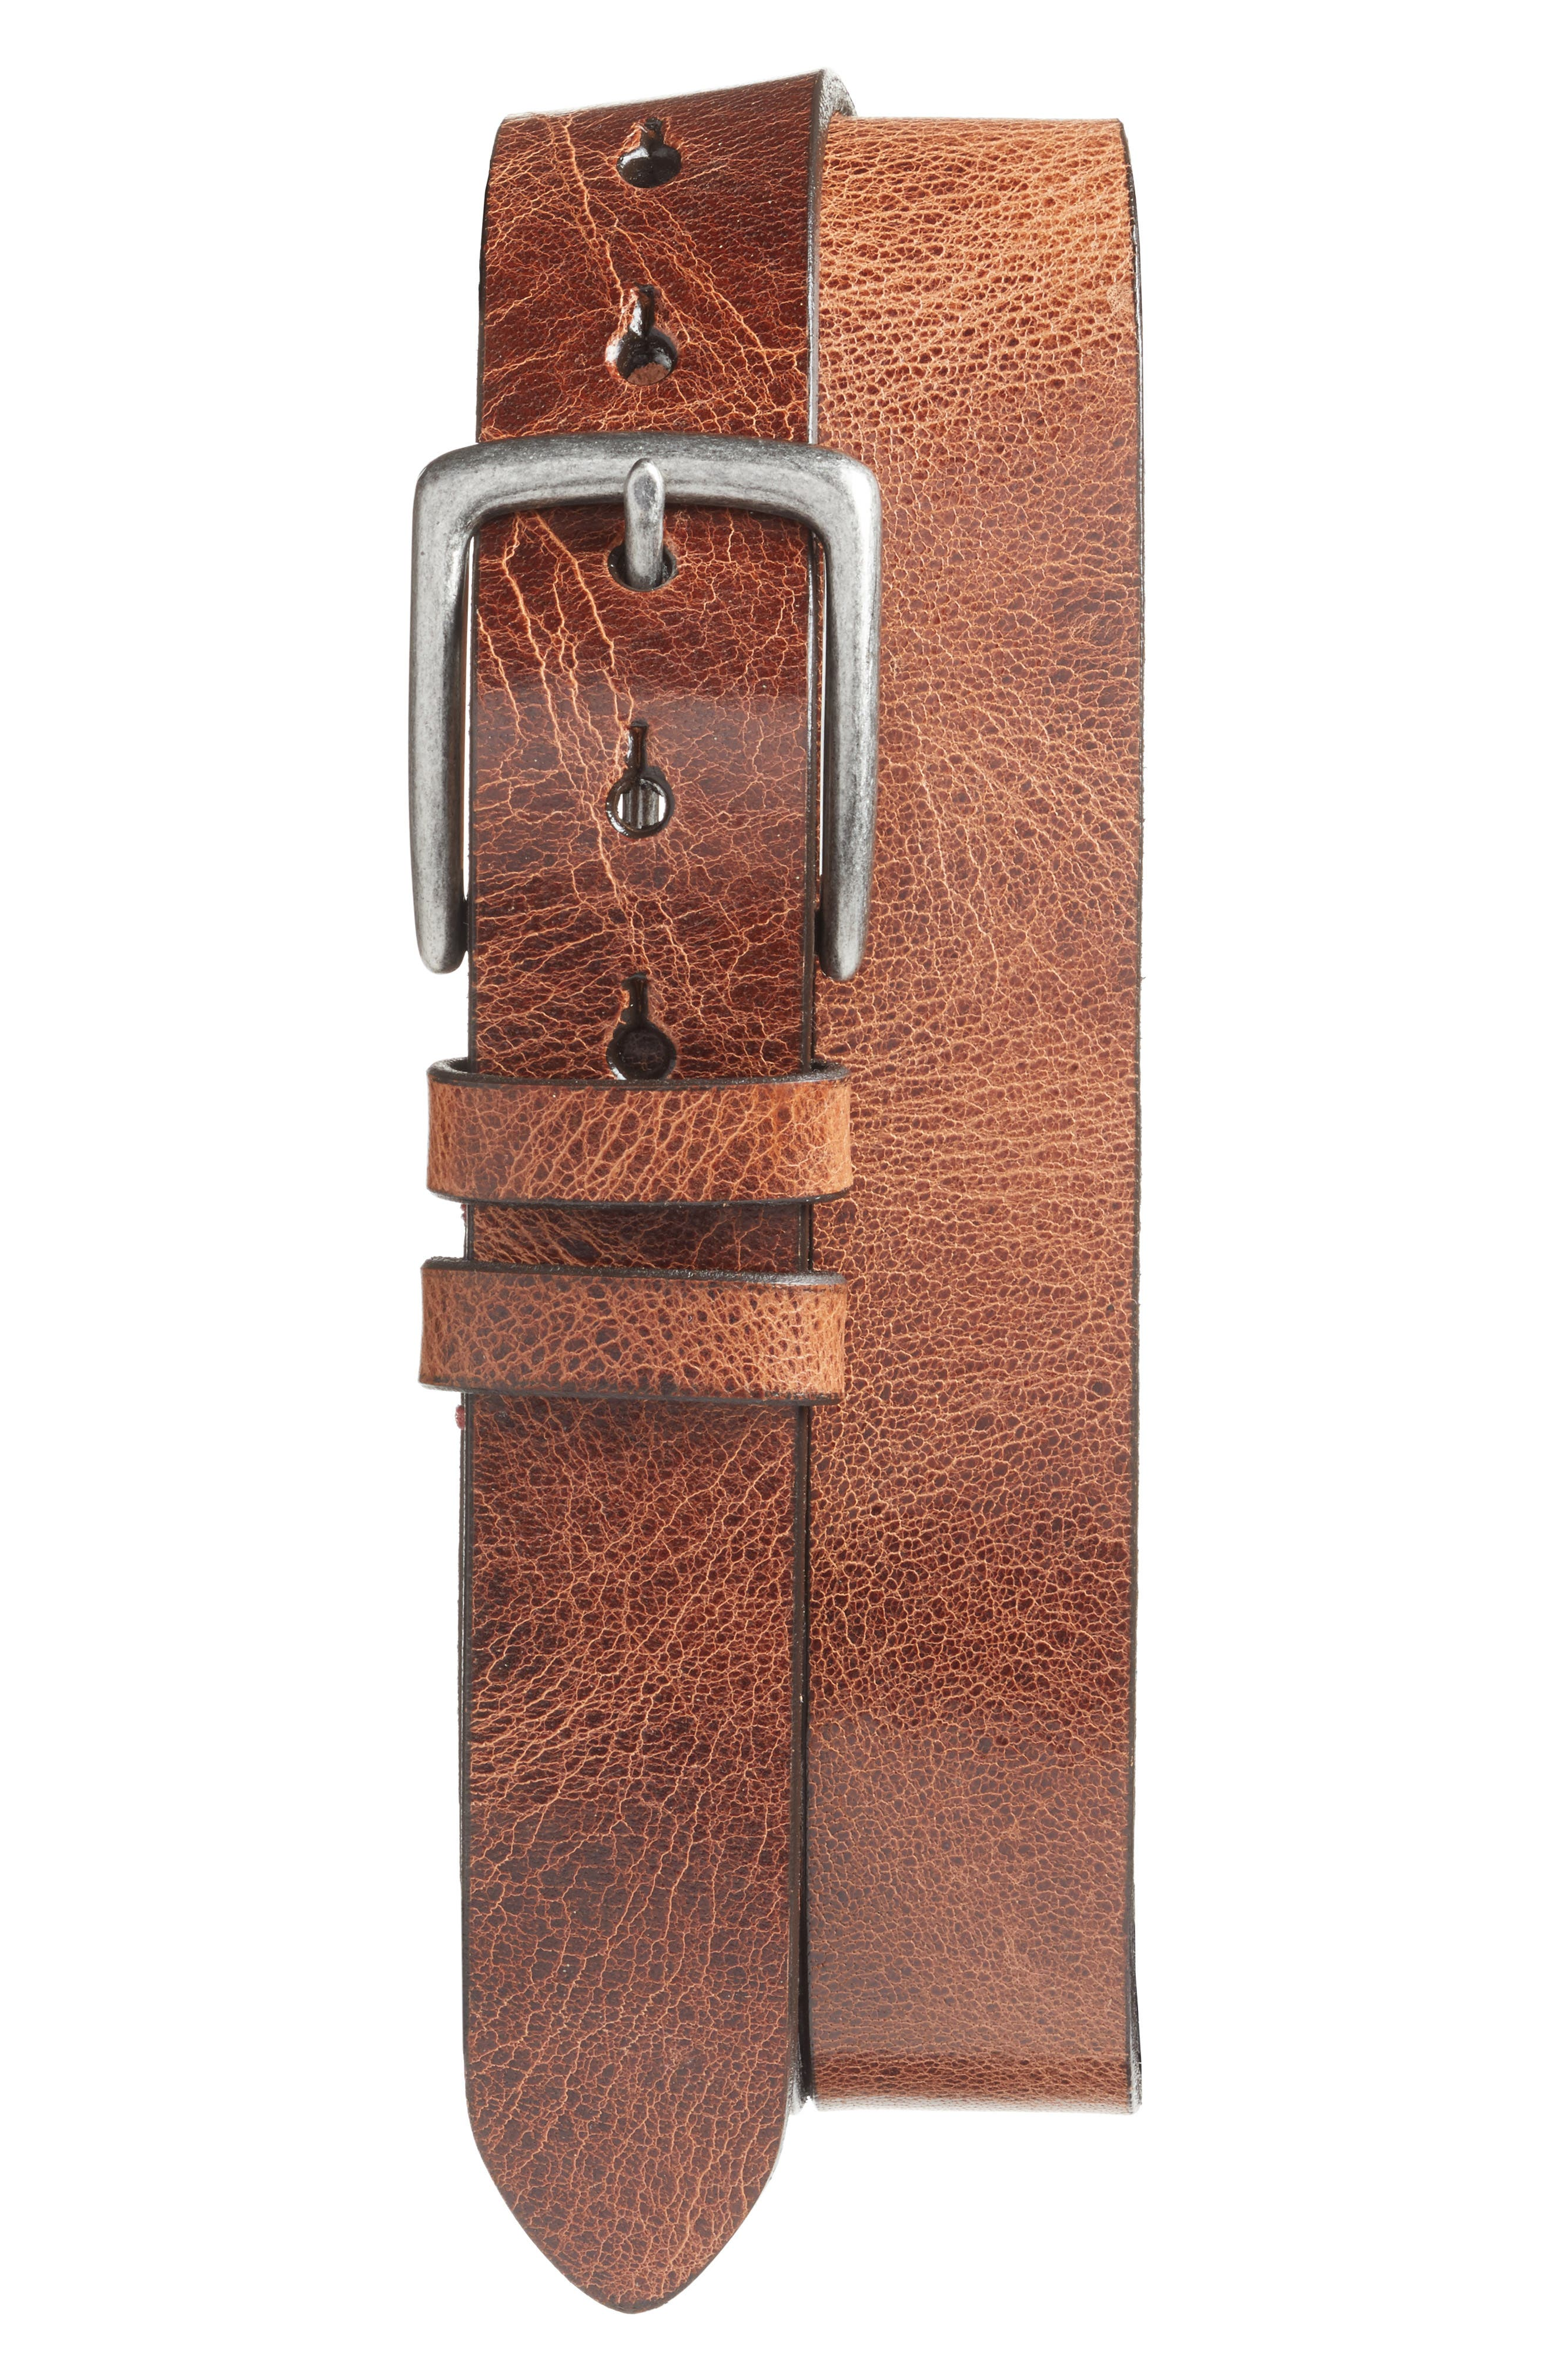 Alternate Image 1 Selected - Torino Belts Leather Belt